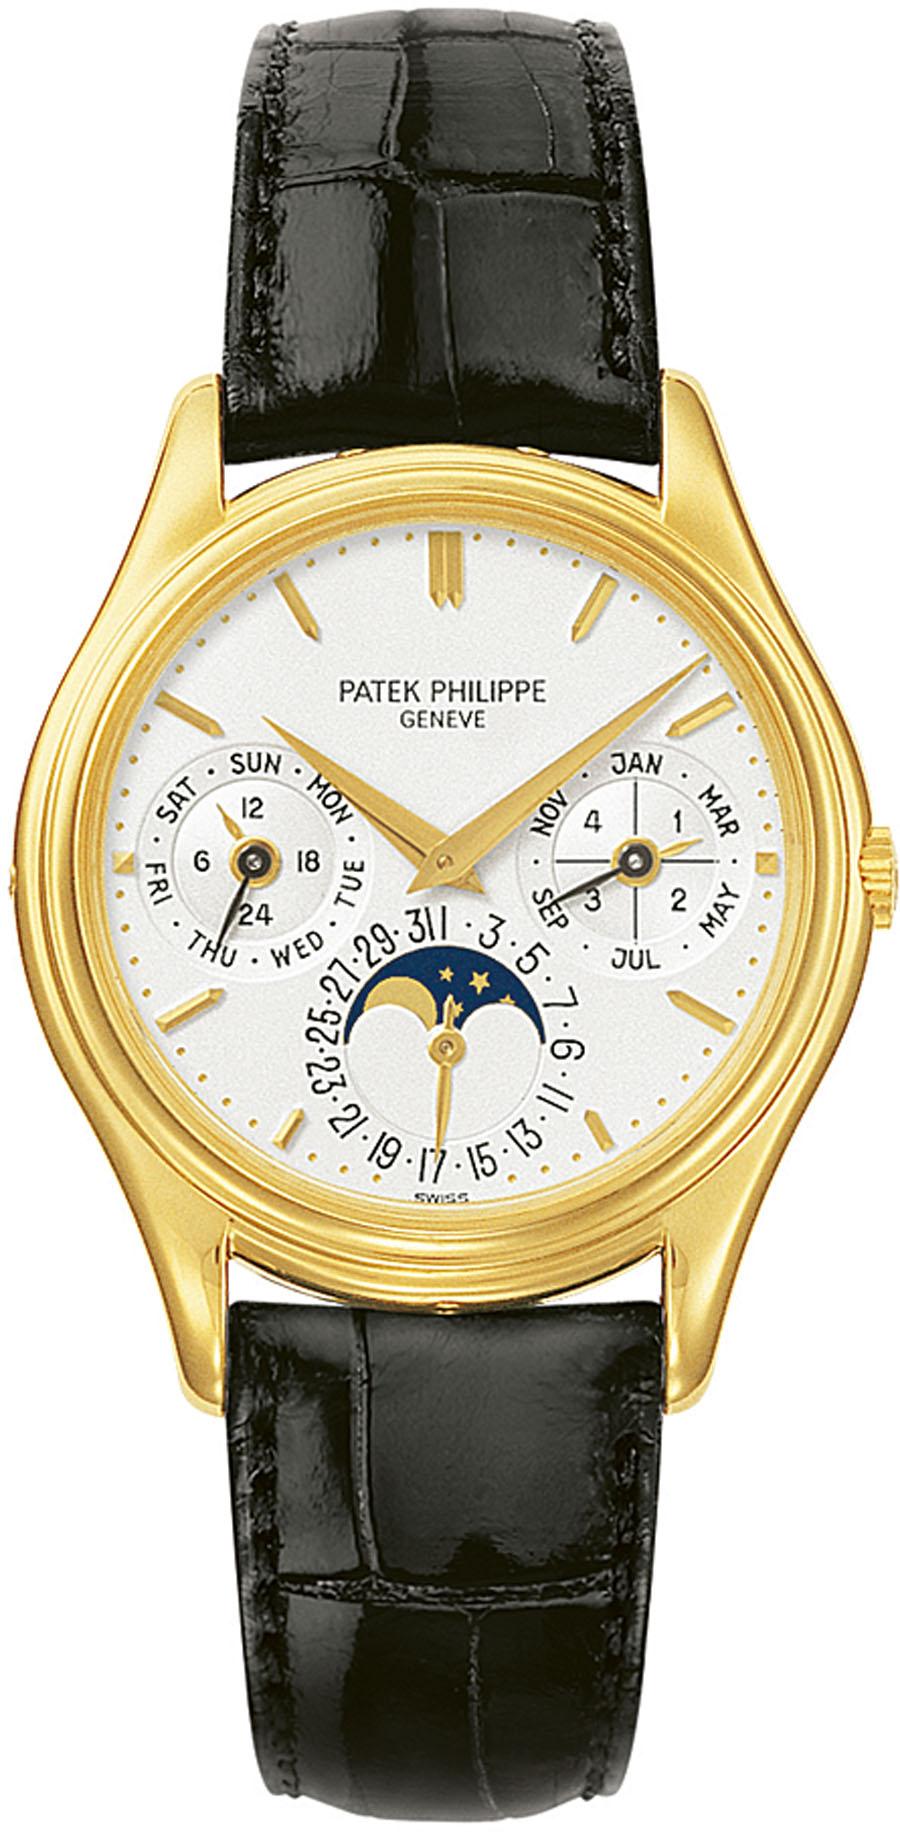 Das Uhrenrevival der 1980er-Jahre: Patek Philippe 3940 Ewiger Kalender